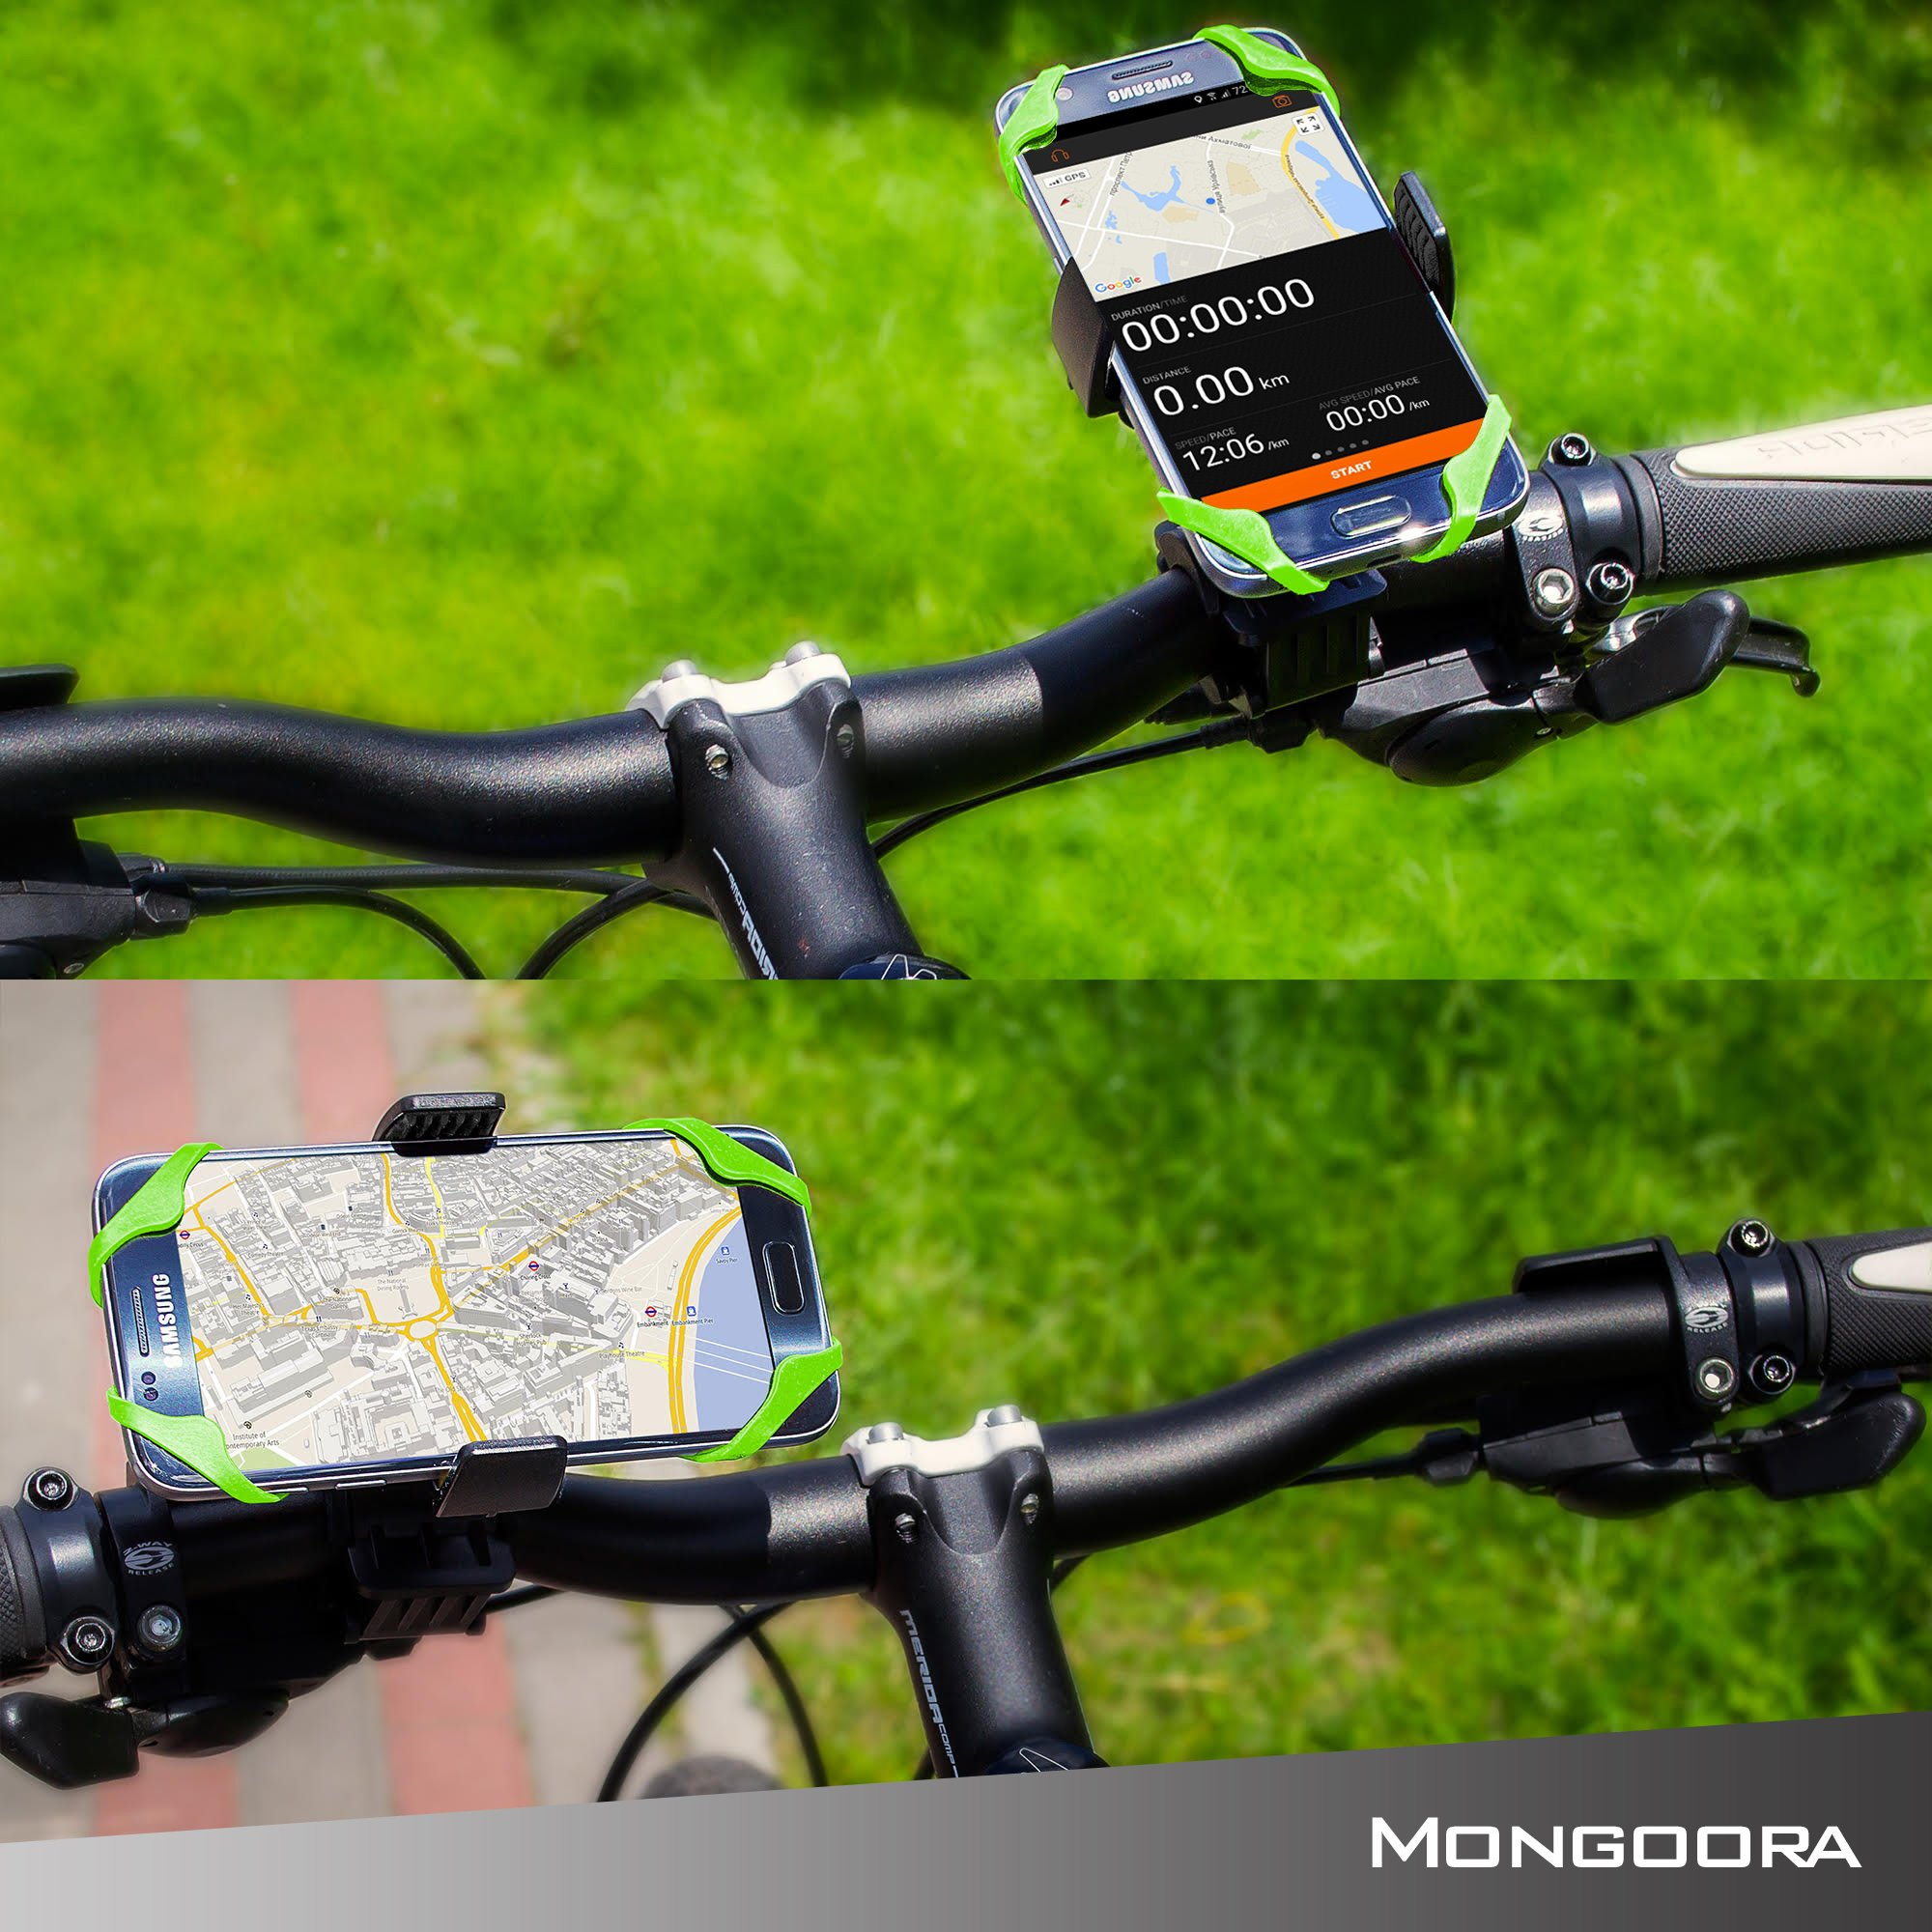 Bike Phone Mount for any Smart Phone: iPhone X 8 7 6 5 plus Samsung Galaxy S9 S8 S7 S7 S6 S5 S4 Edge, Nexus, Nokia, LG. Motorcycle, Bicycle Phone Mount. Mountain Bike Mount. Bike Accessories. by Mongoora (Image #2)